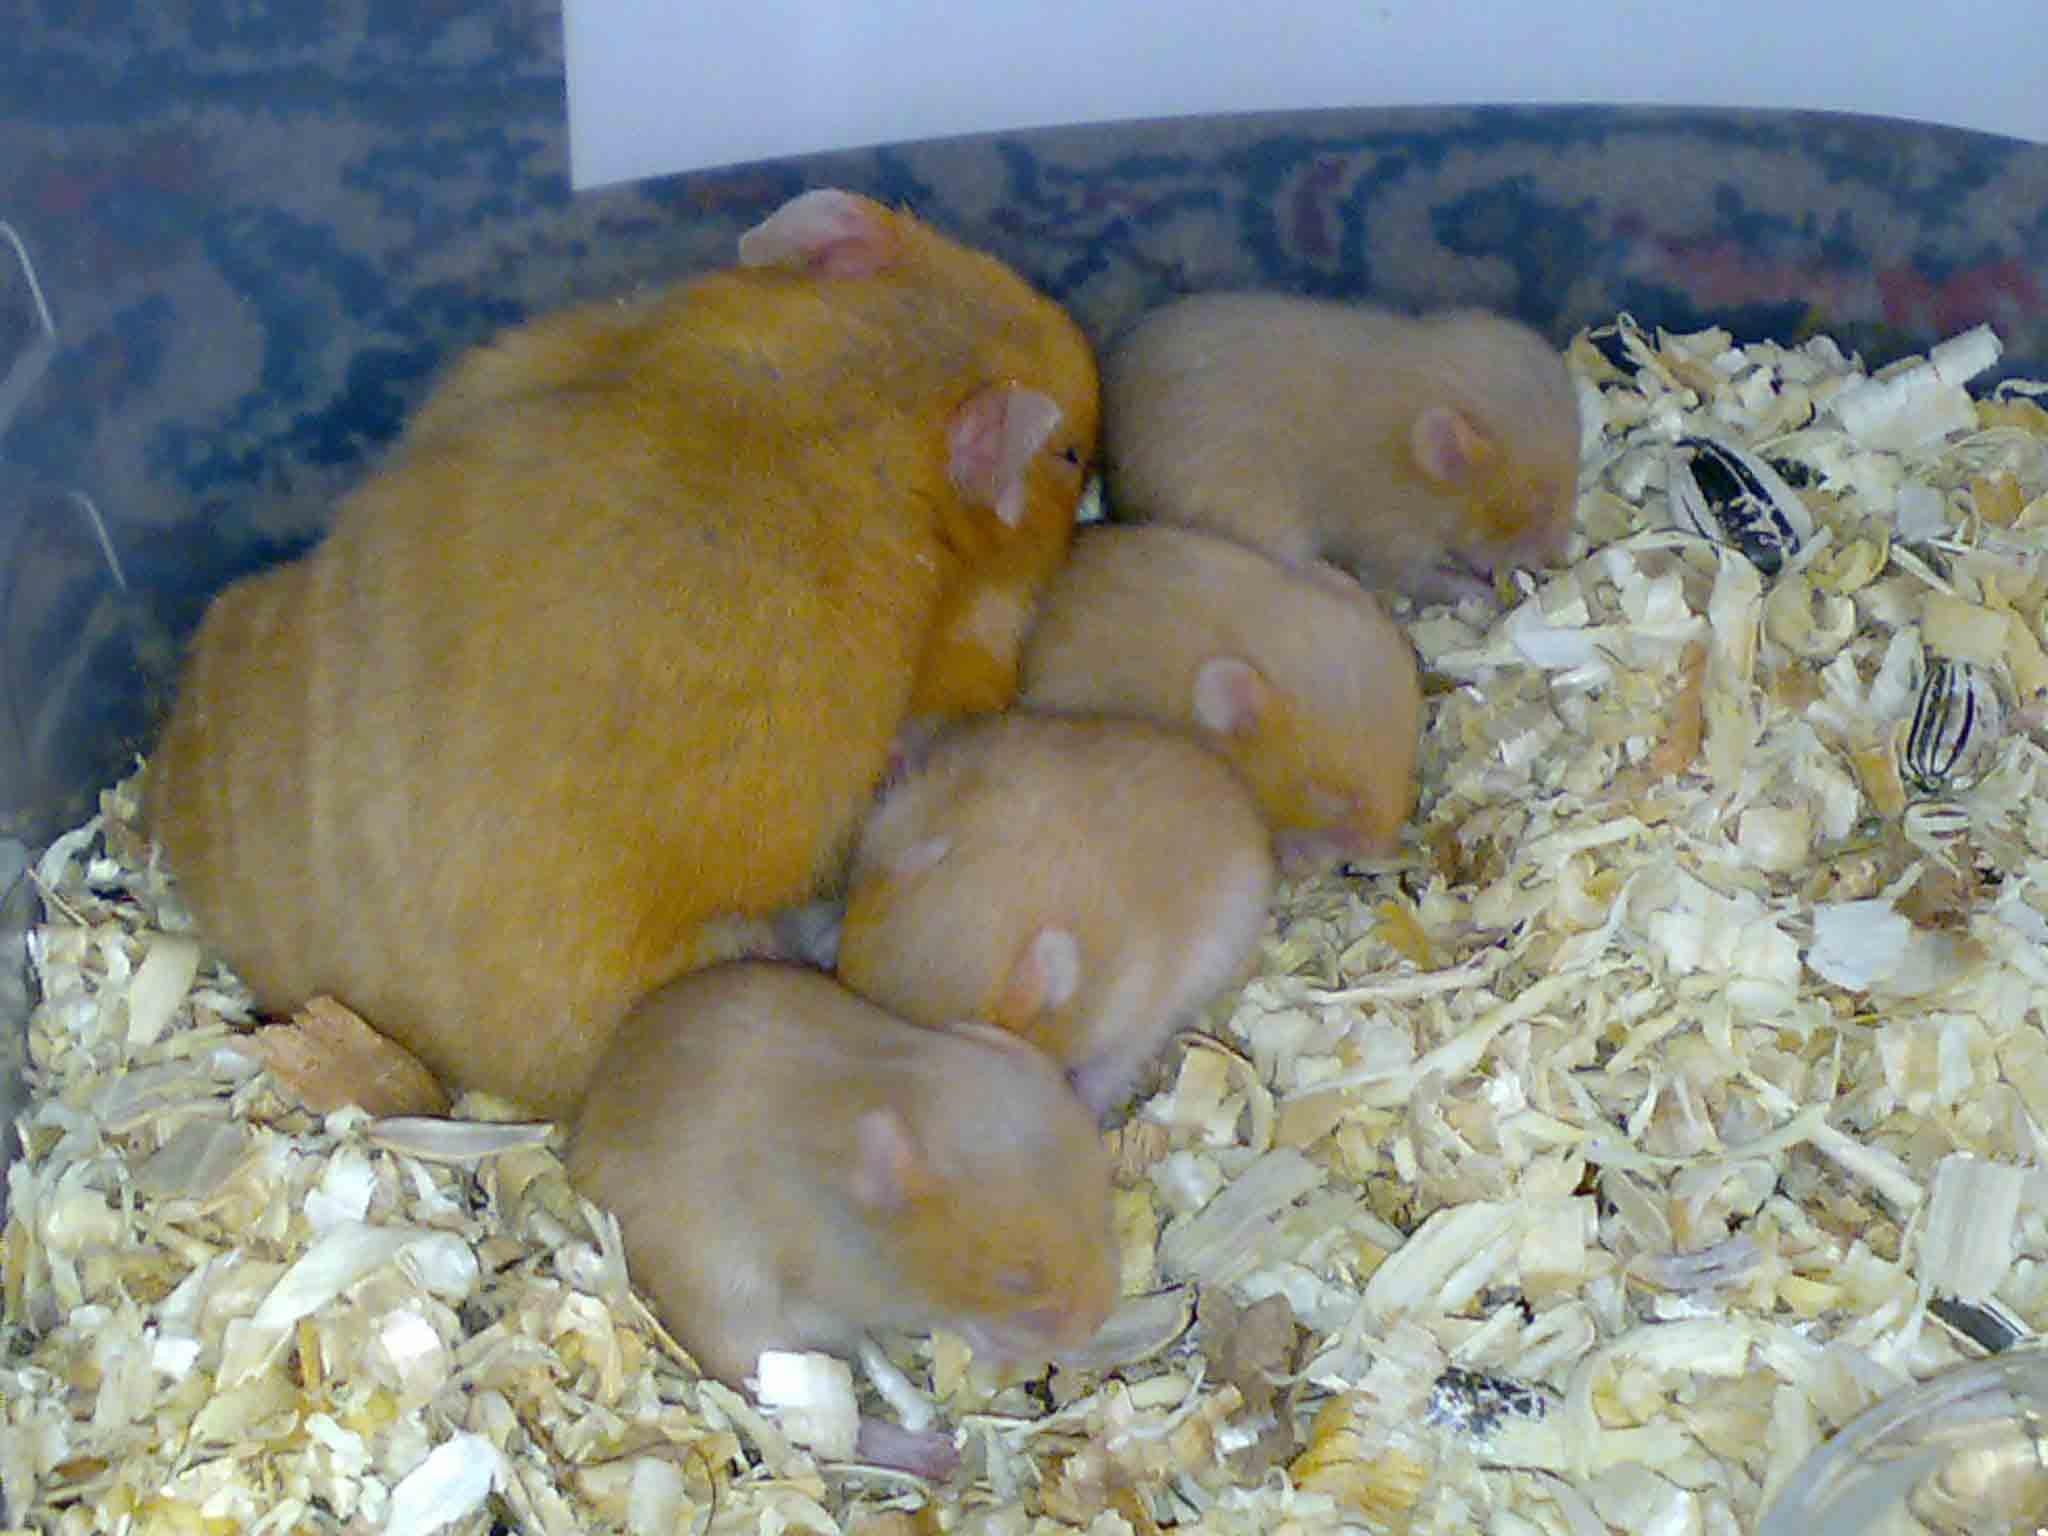 http://hamster.persiangig.com/image/144.jpg